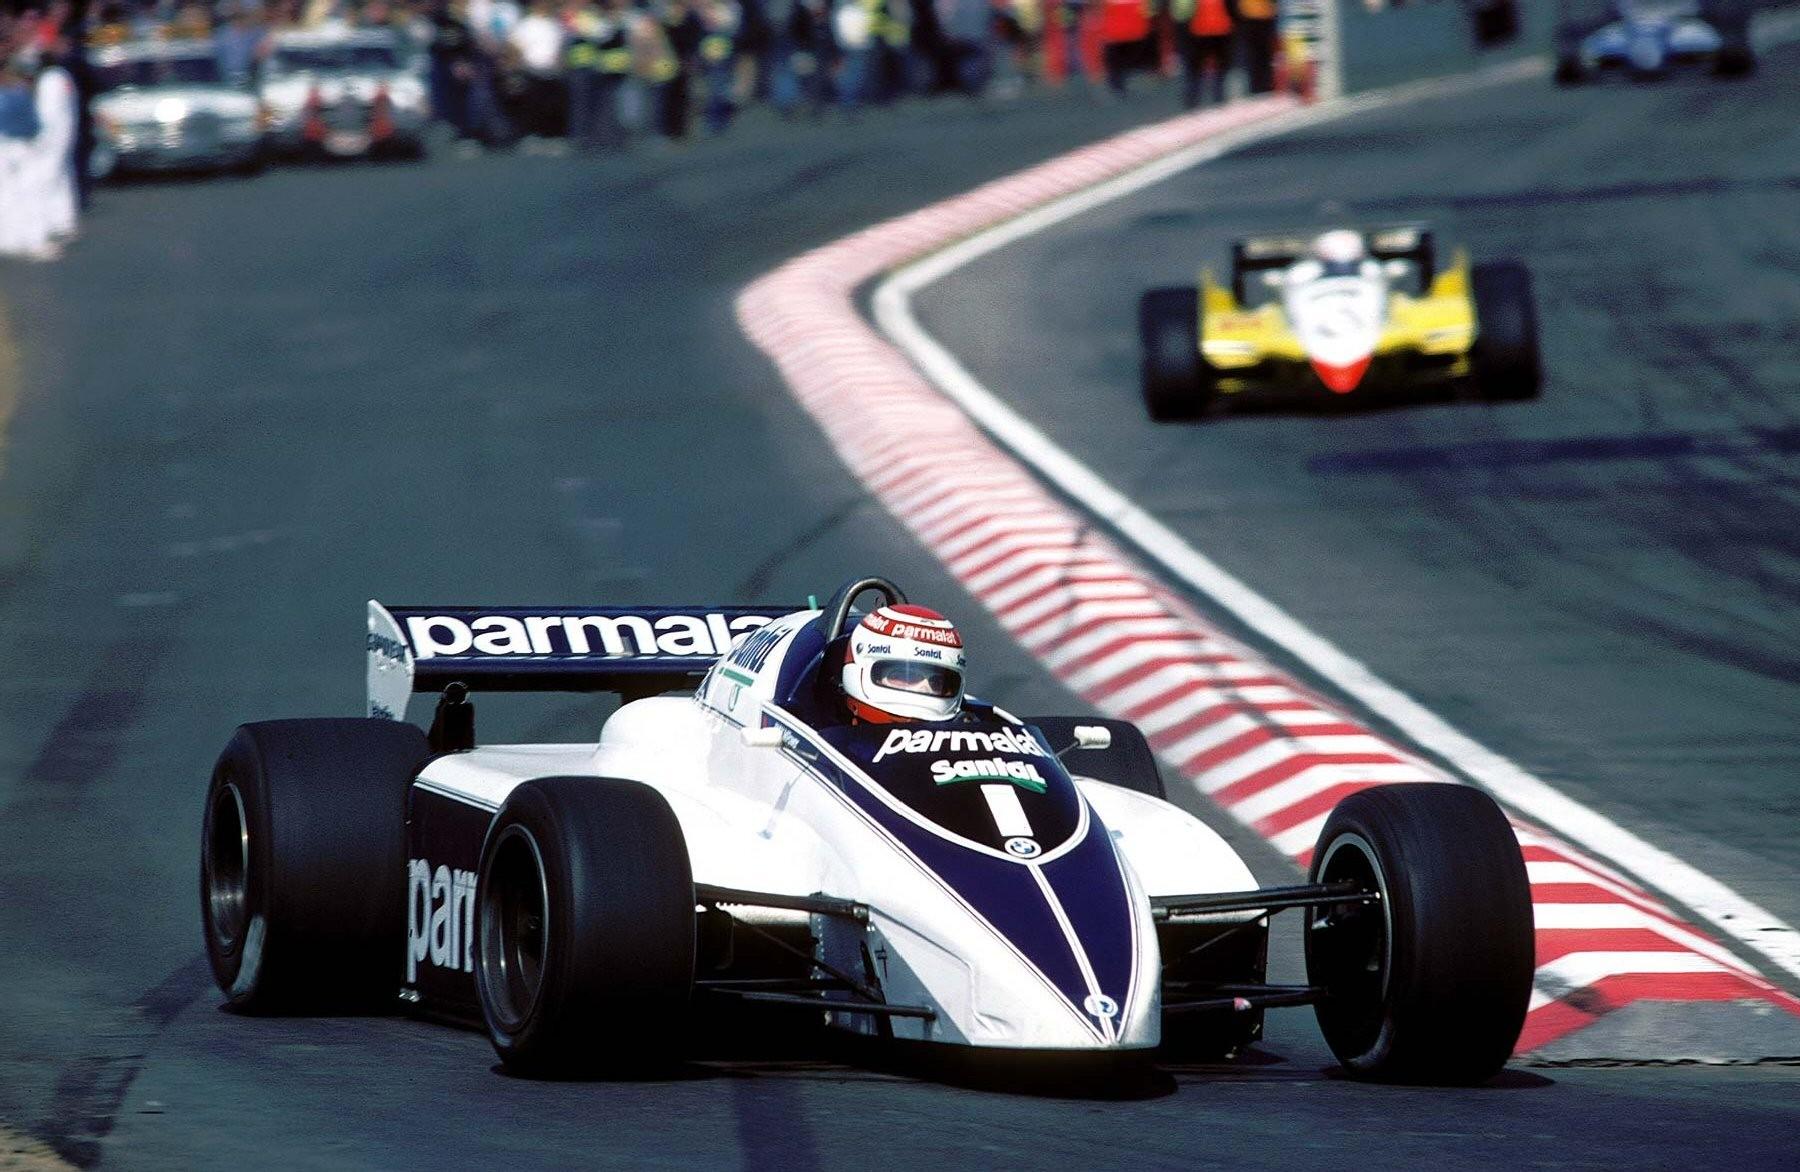 General 1800x1172 race tracks vintage race cars vehicle car sport  sports racing